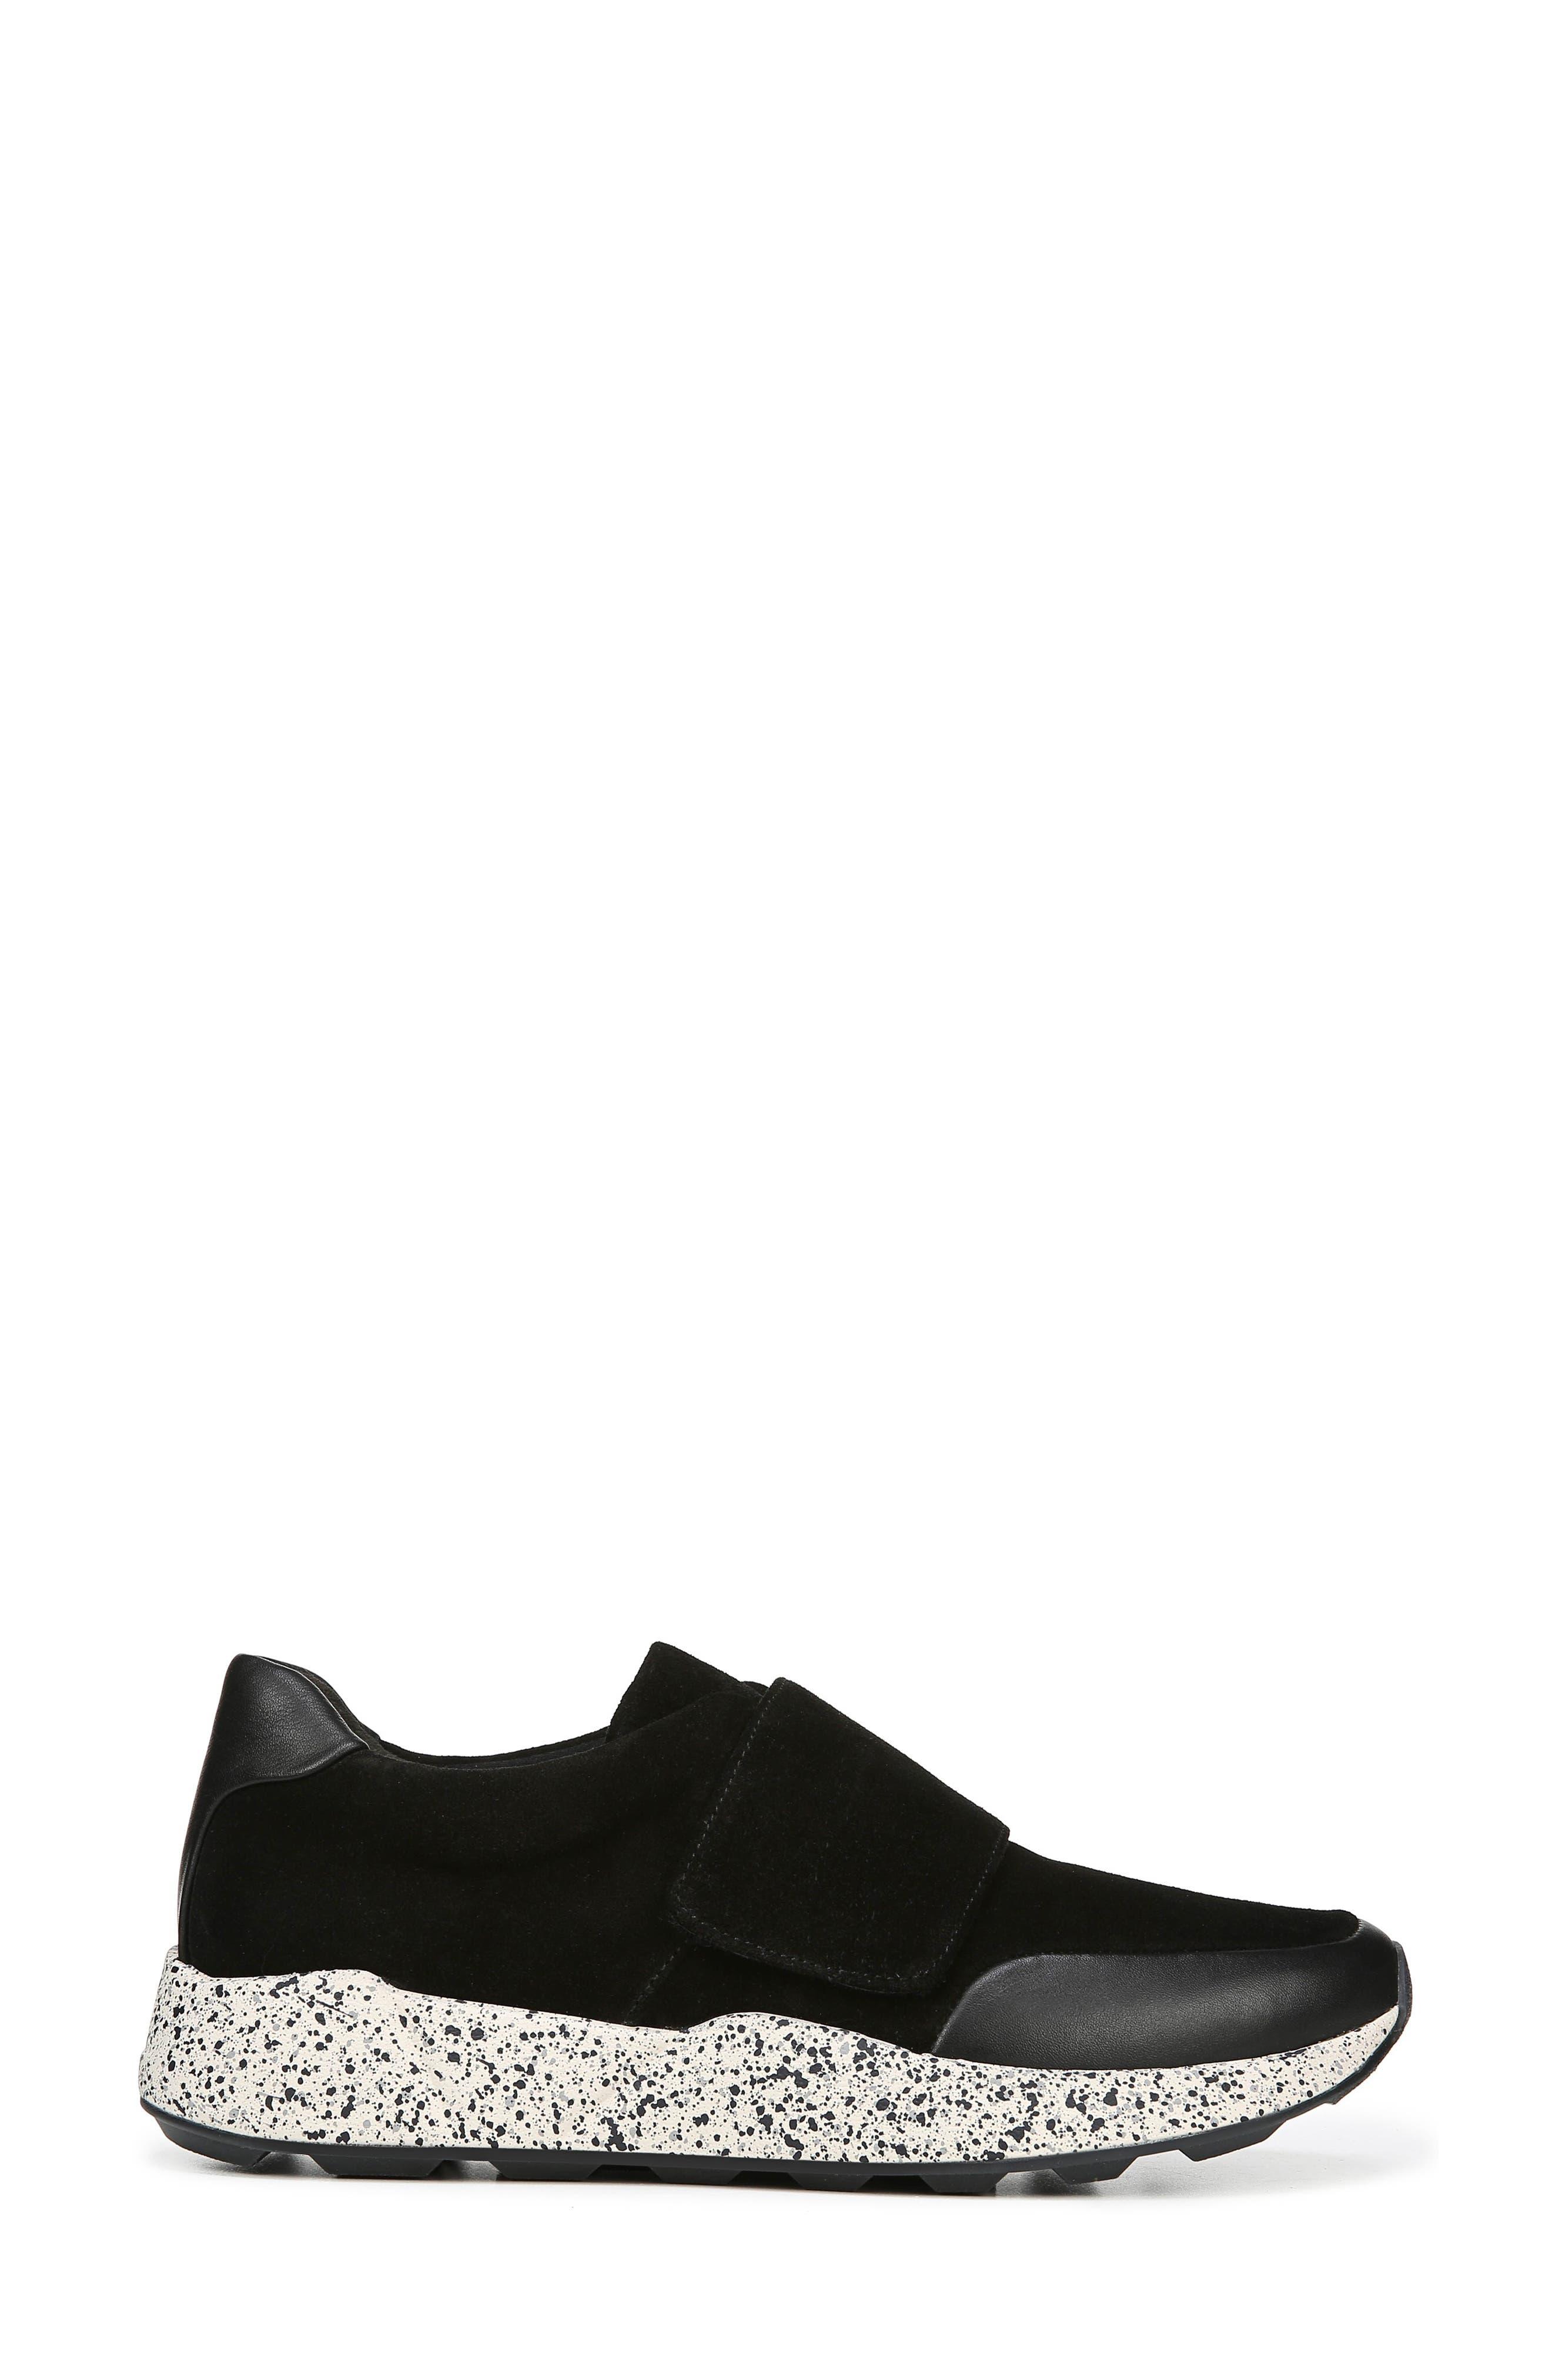 Gage Sneaker,                             Alternate thumbnail 3, color,                             BLACK COCO